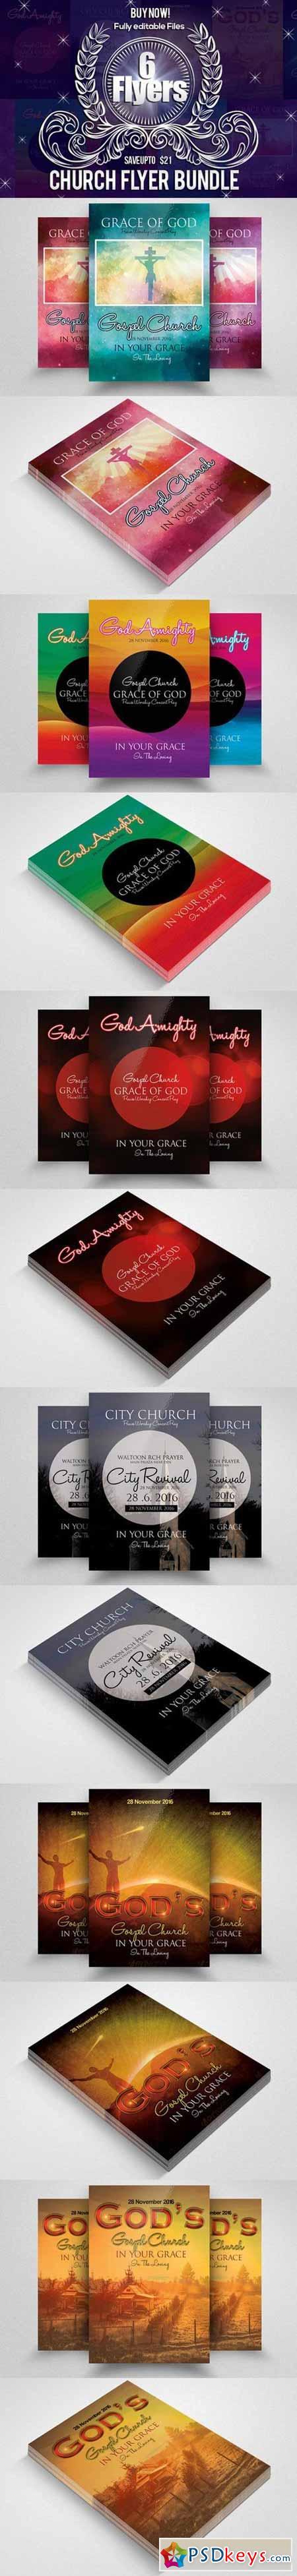 6 Jesus Church Flyer Bundle 614689